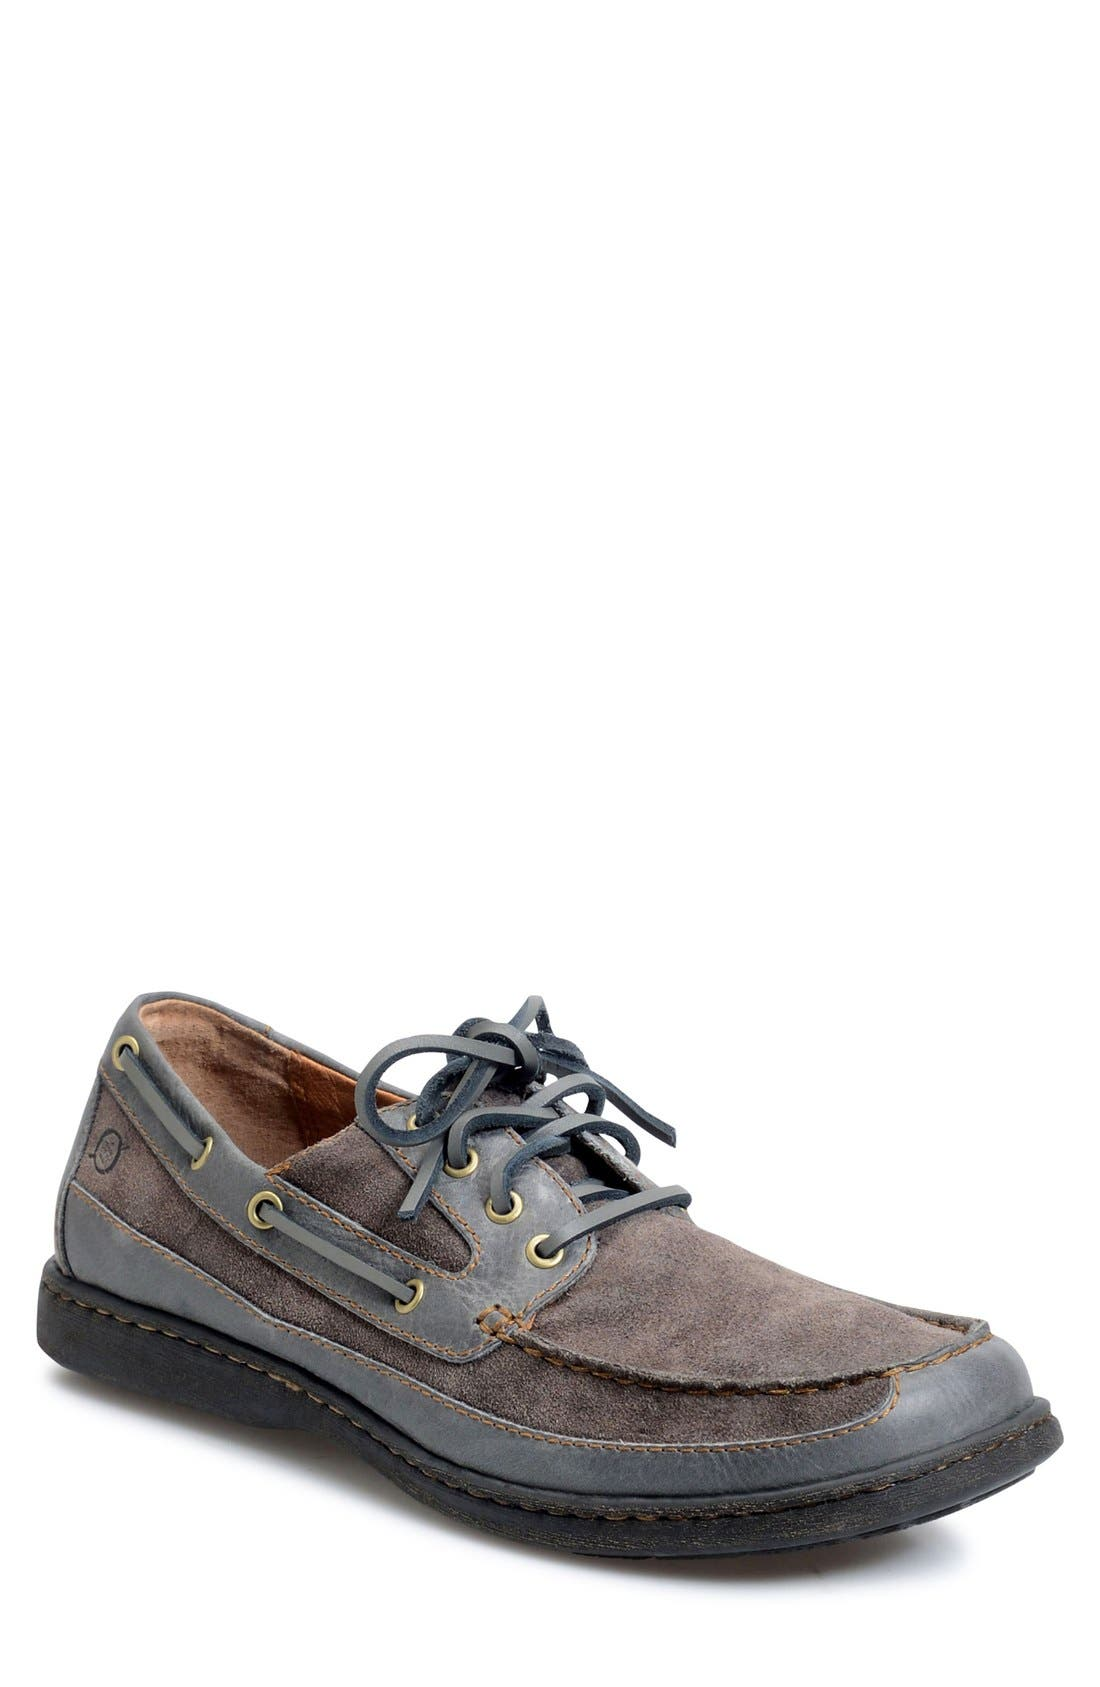 'Harwich' Boat Shoe,                             Main thumbnail 1, color,